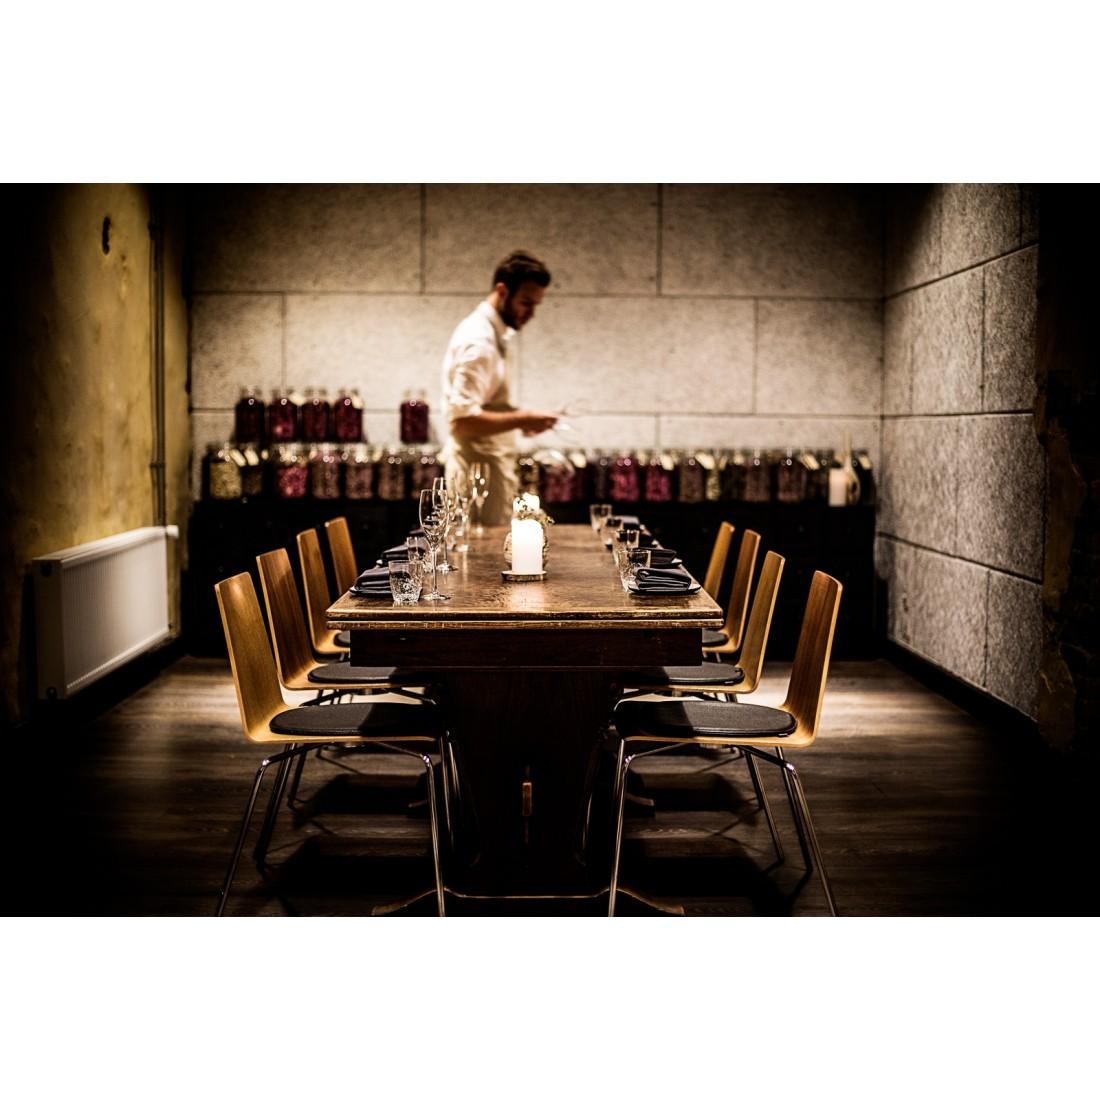 champagnemiddag med Bruno Paillard på Restaurant Domestic torsdag den 19 september kl. 18.00-31